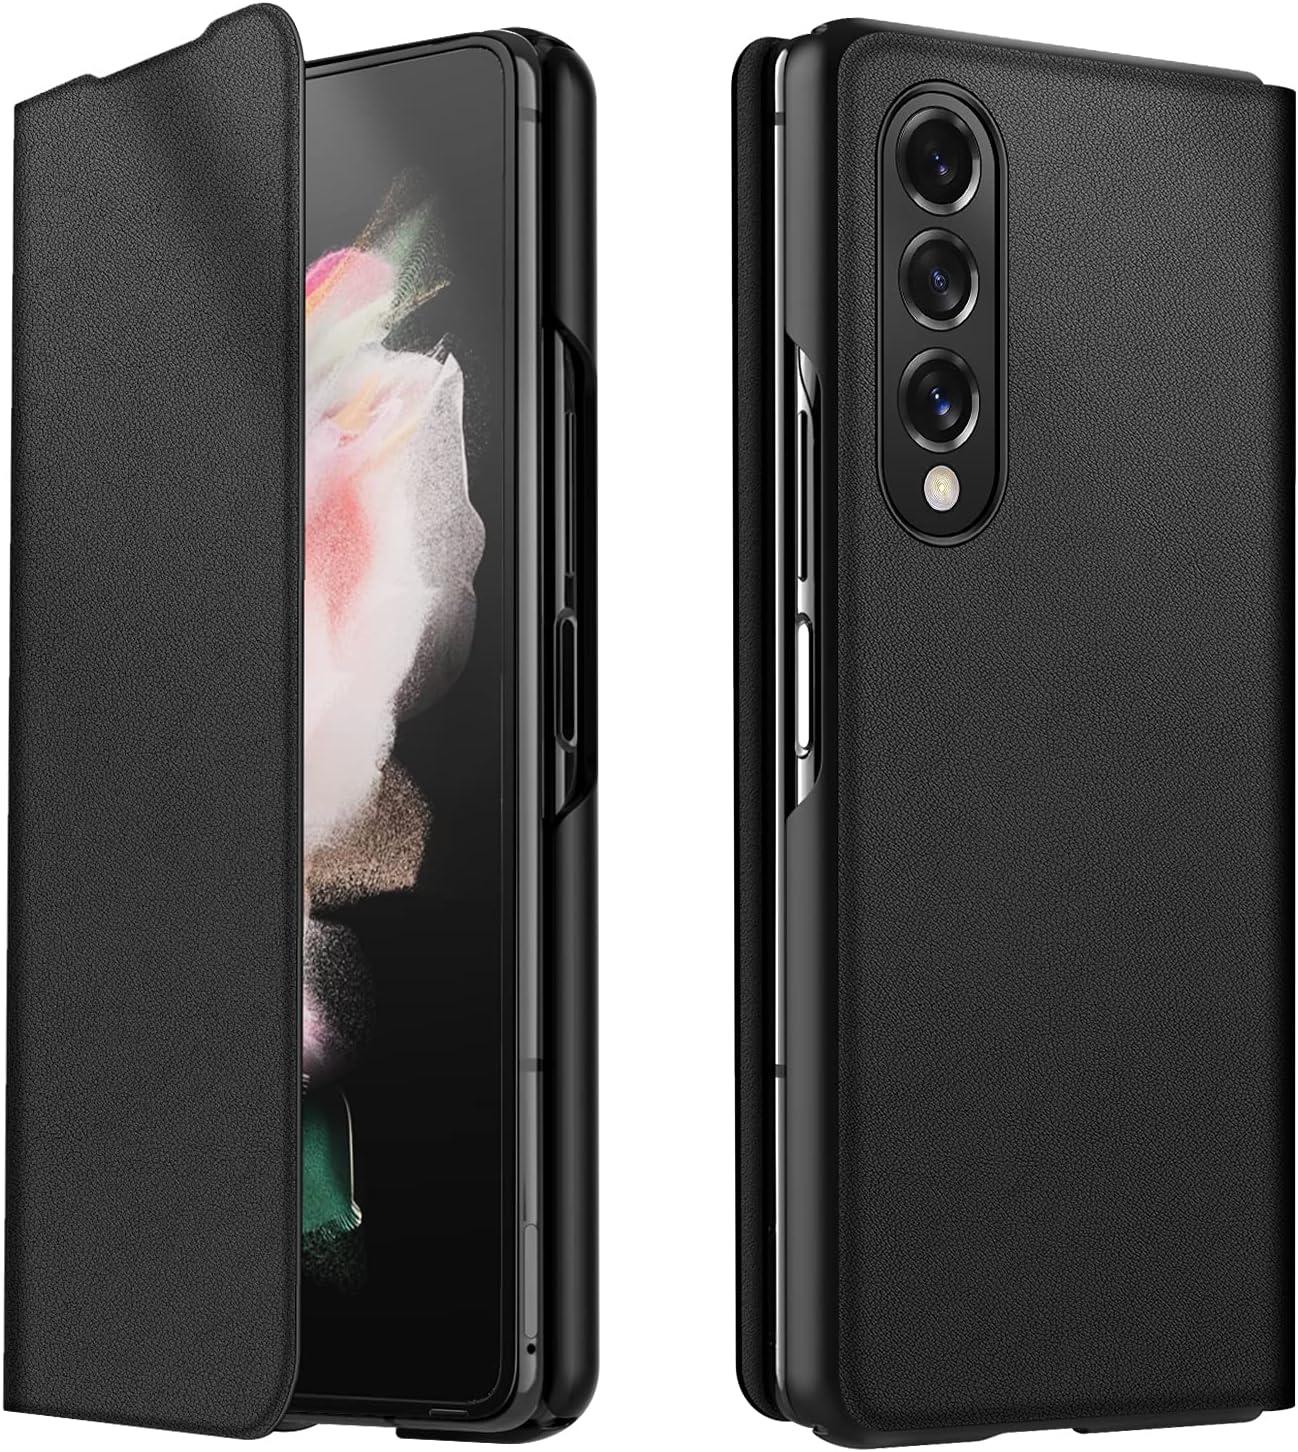 CENMASO Designed for Samsung Galaxy Z fold 3 Case, Ultra-Thin Leather Magnetic Flip Bumper Case for Galaxy z Fold 3 (2021)- Black